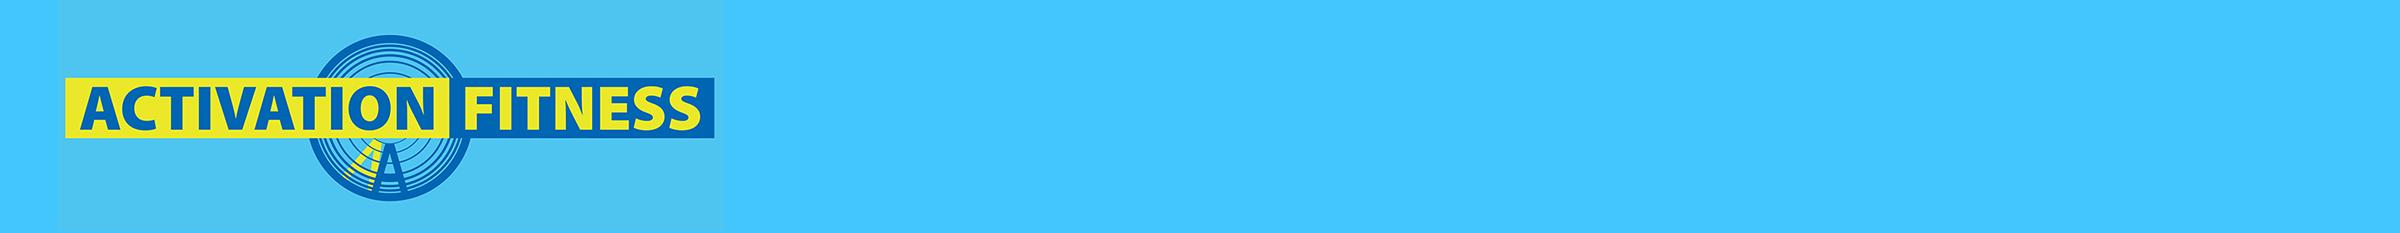 Activation-Fitness-Logo-w-blue-bg